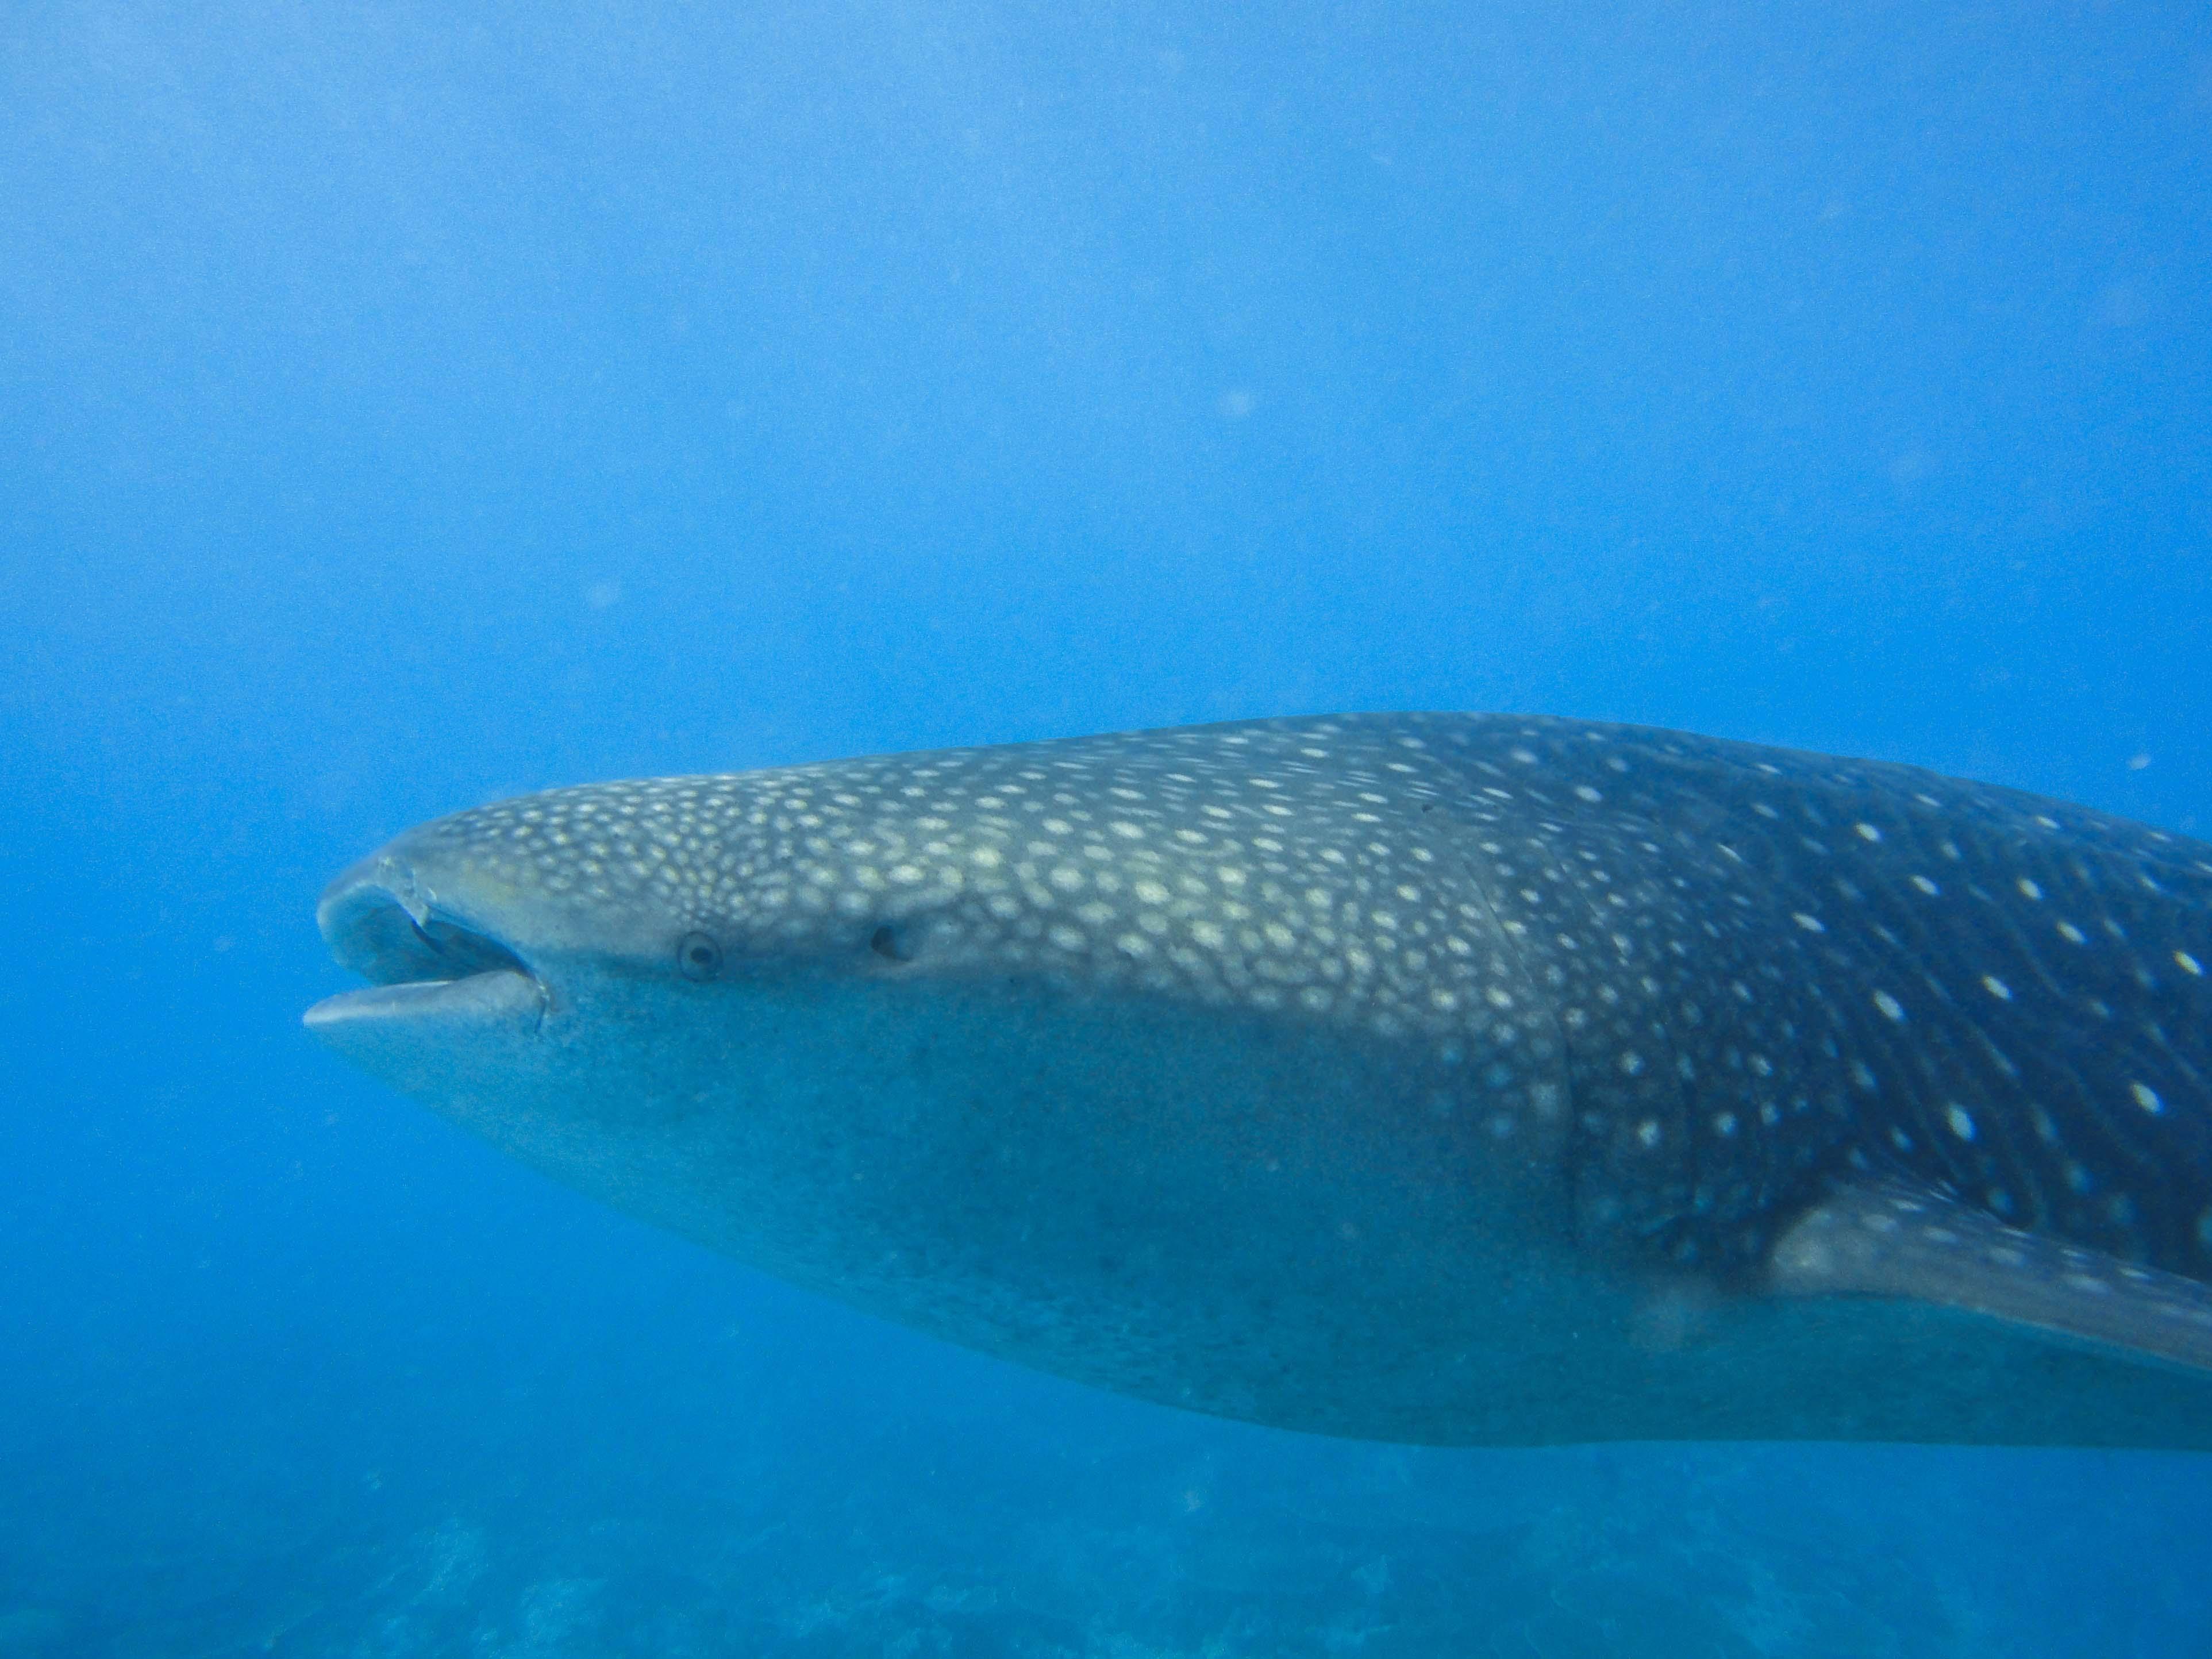 Lacabana Maldives  A DhMaamigili Island Whale Shark (1)